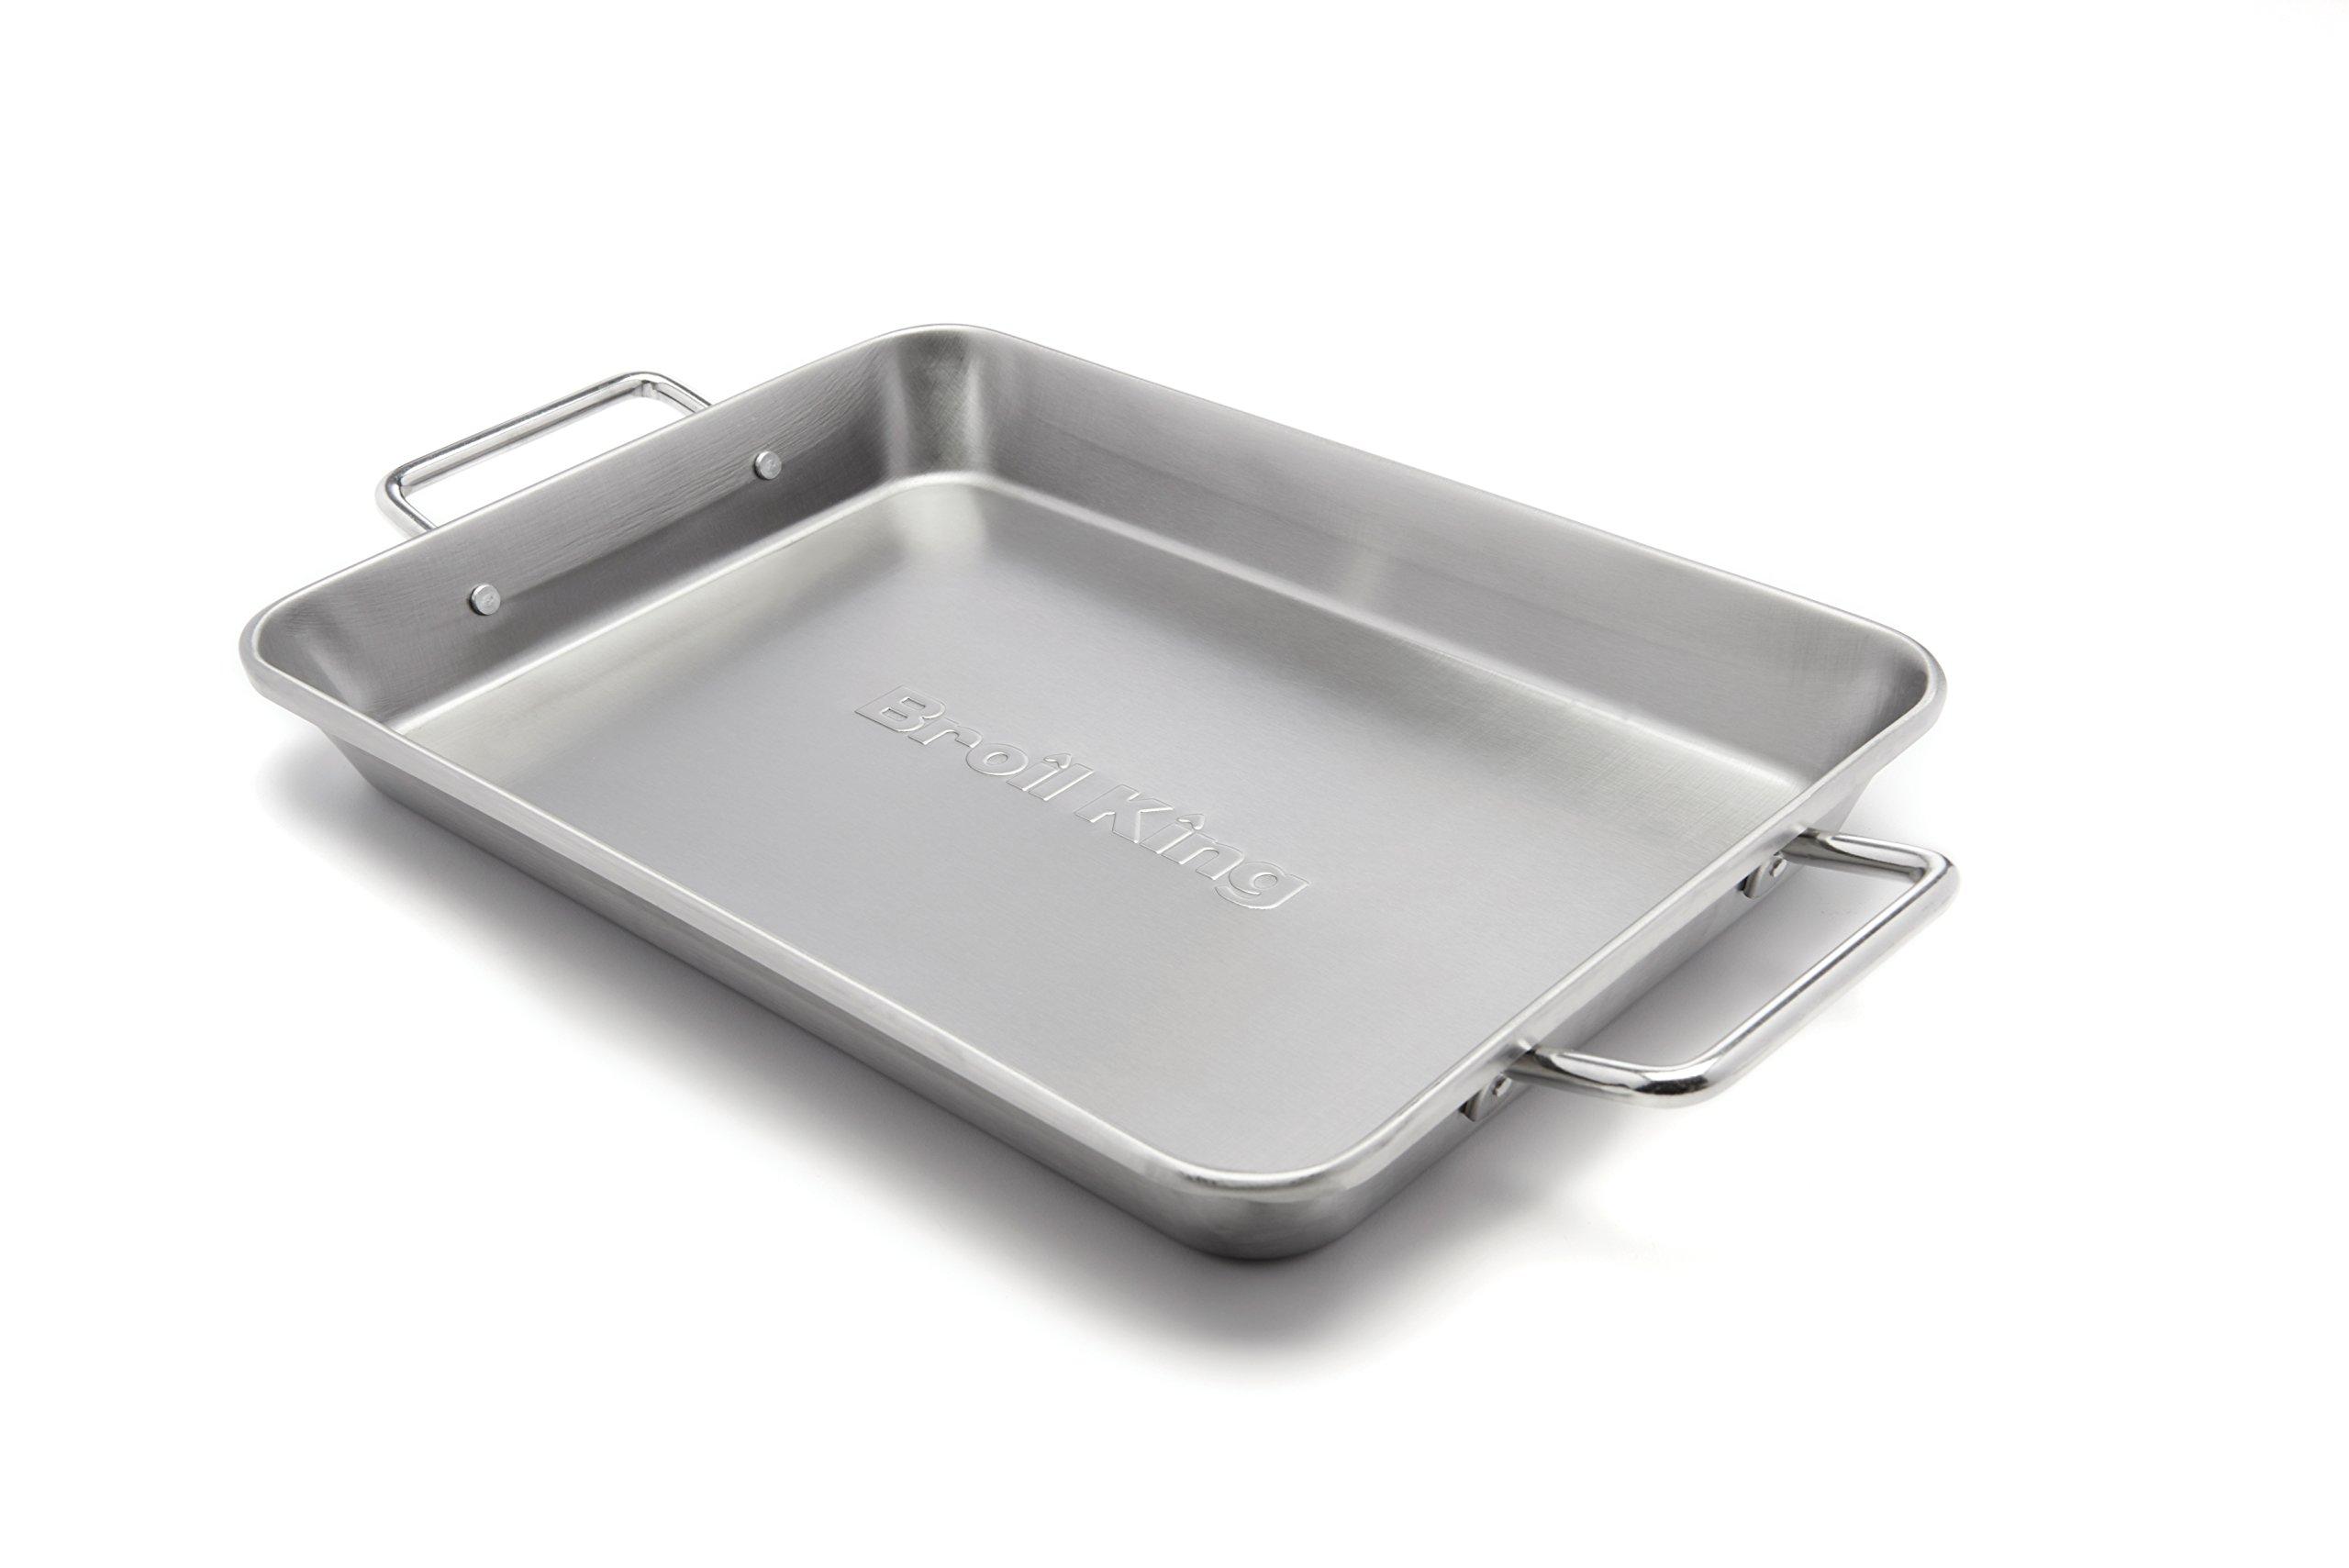 Broil King 63105 Roasting Pan